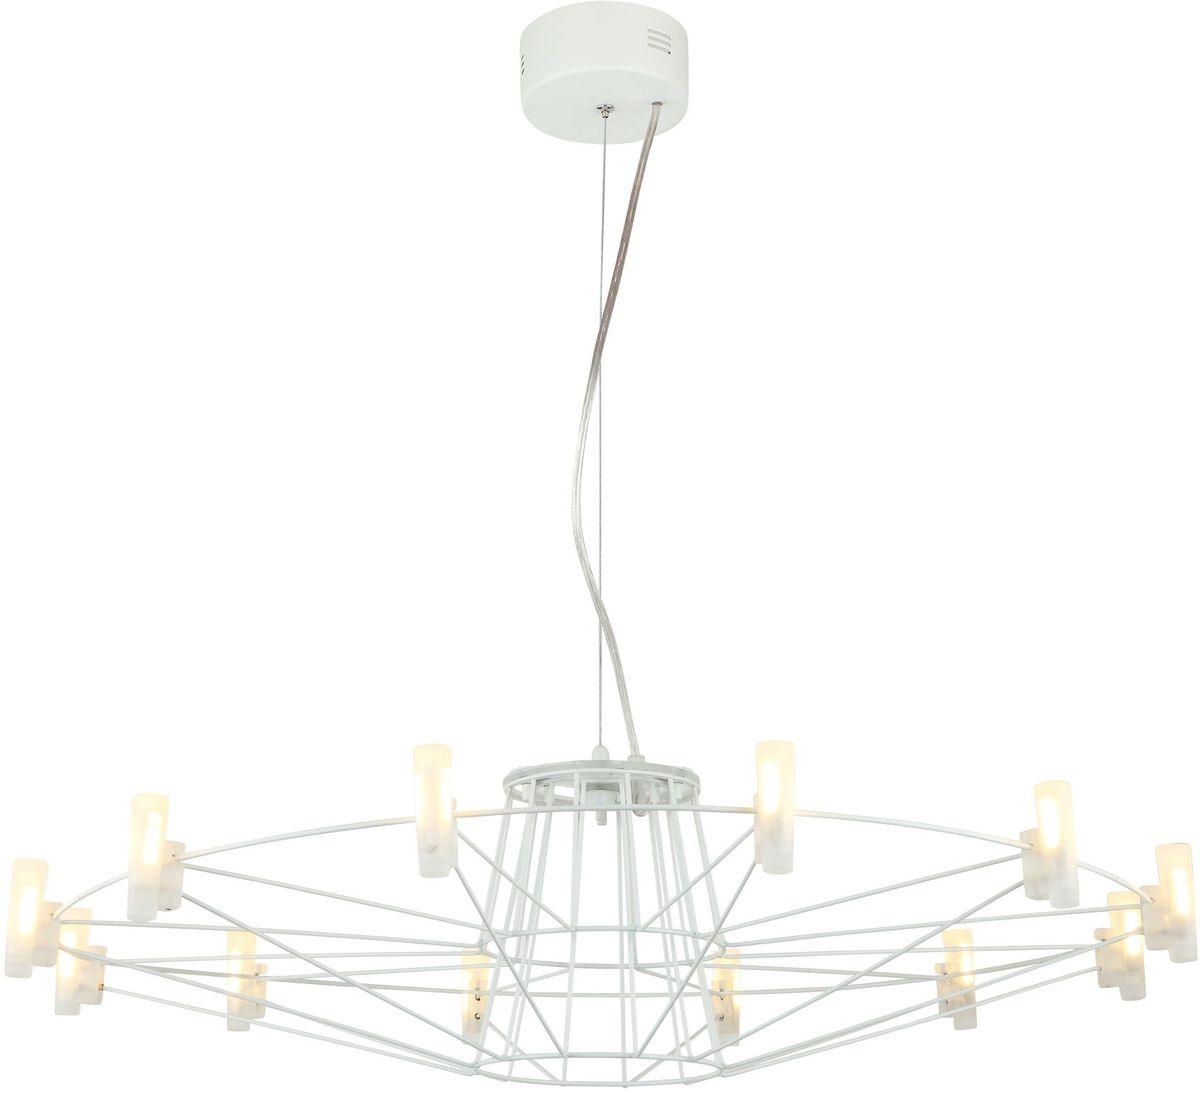 Люстра подвесная Favourite Salute, 12 х LED, 2. 1637-12P1637-12P